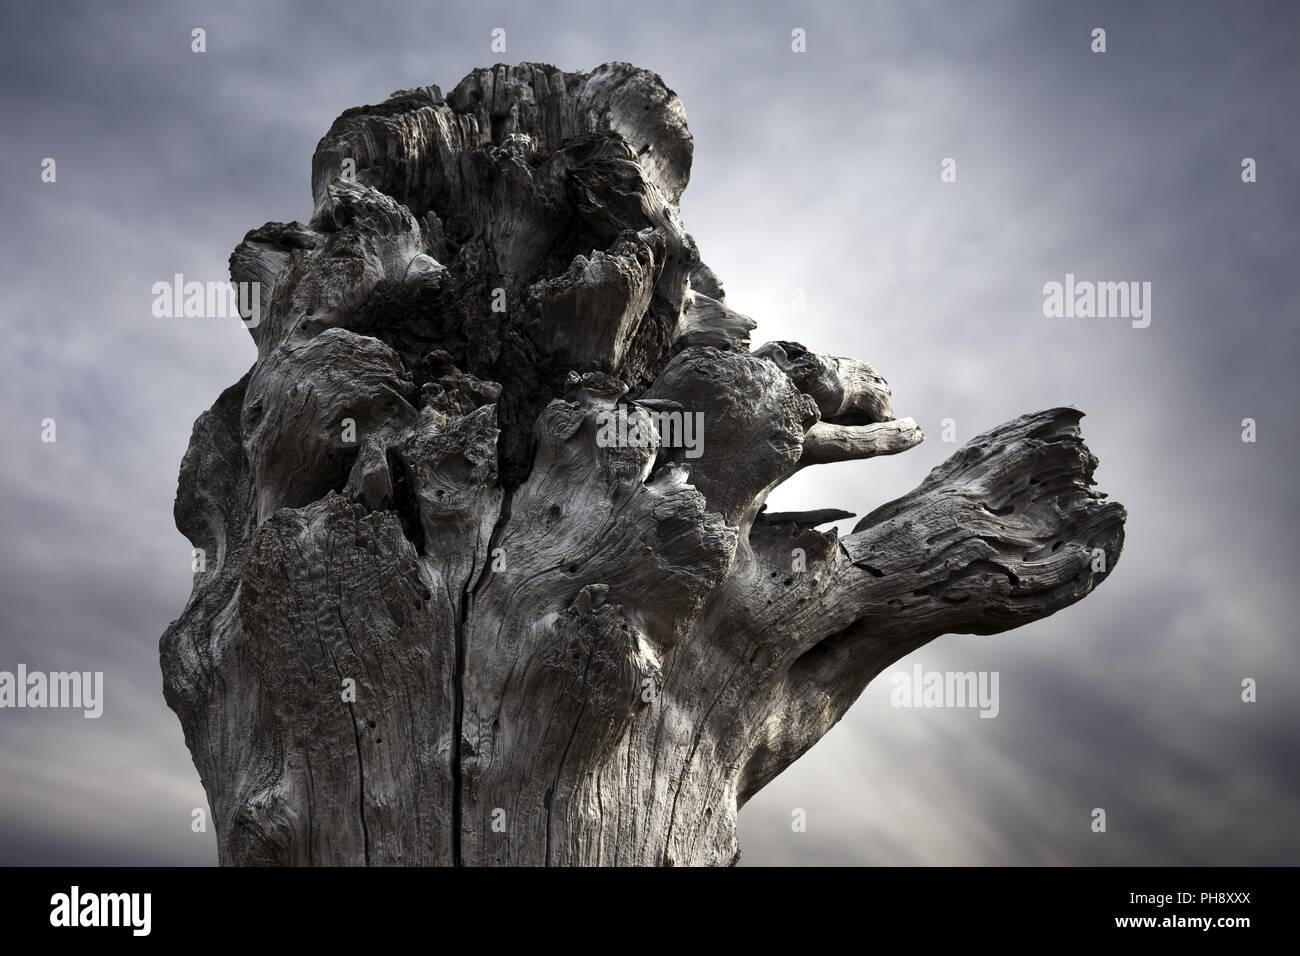 Madera de deriva místico, Snaefellsnes, Islandia Imagen De Stock